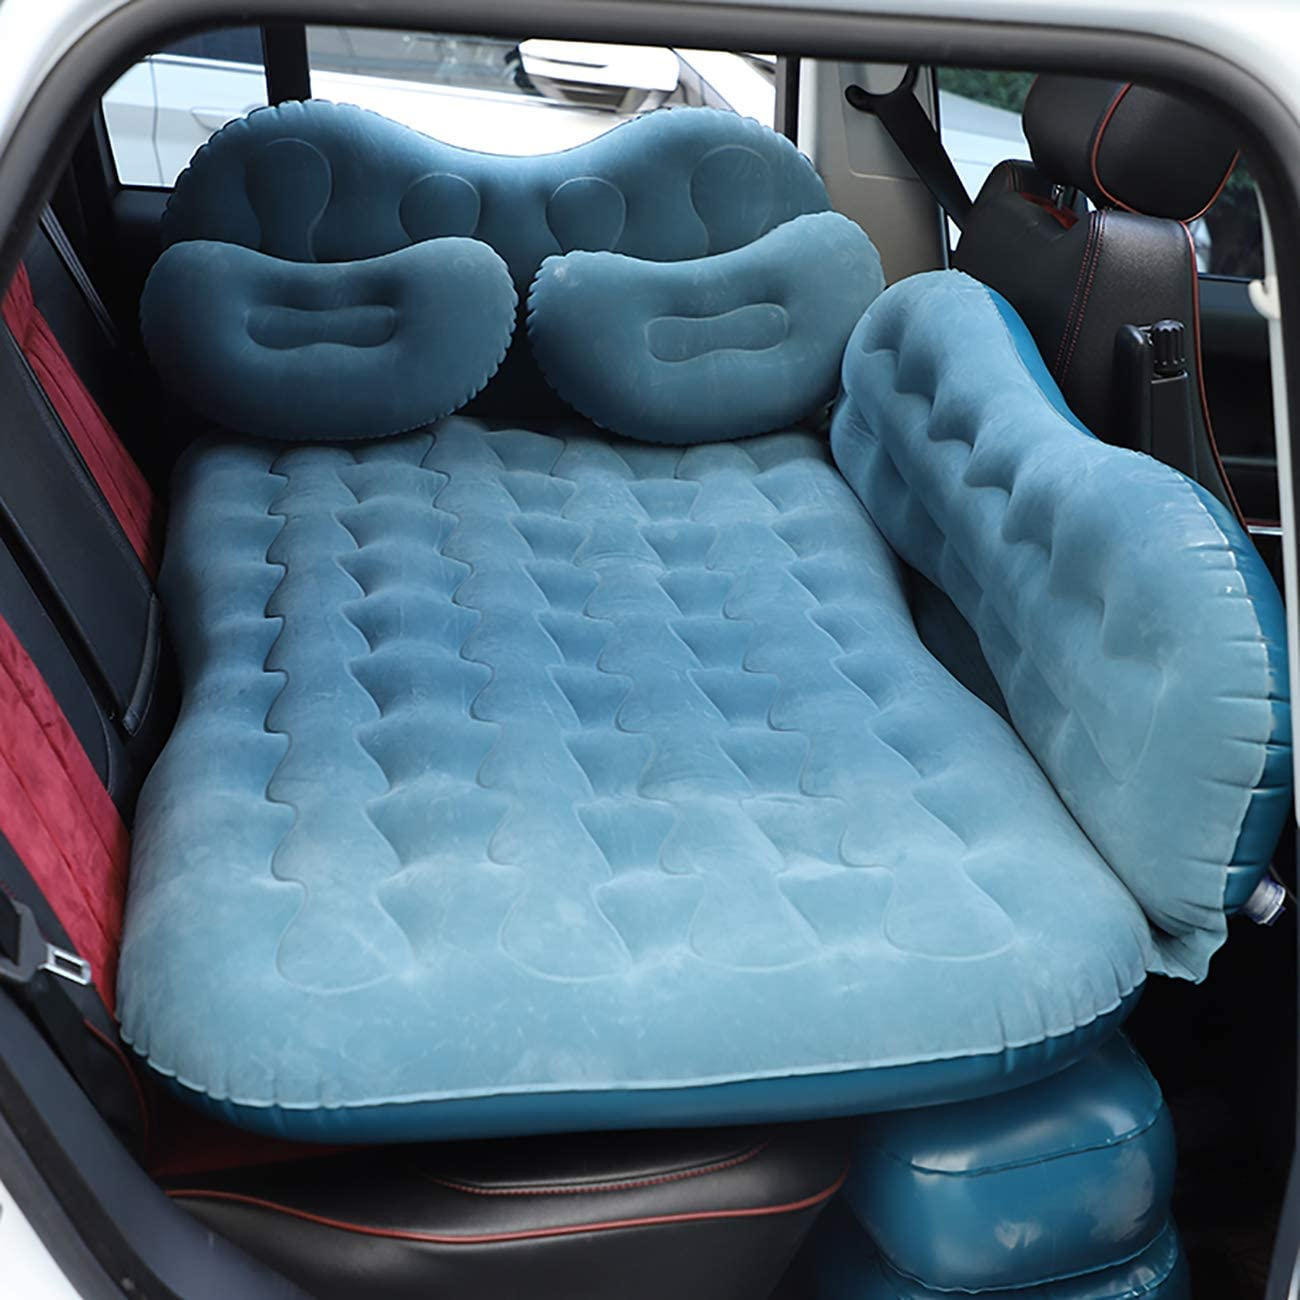 Portable Car Bed fits Car -Camping Inflation Bed Travel Air Bed Car Back Seat-Blow Up Air Mattress CALOER Thick Inflatable Car Air Mattress with Pocket,Headboard,Pillows and Air Pump SUV Truck